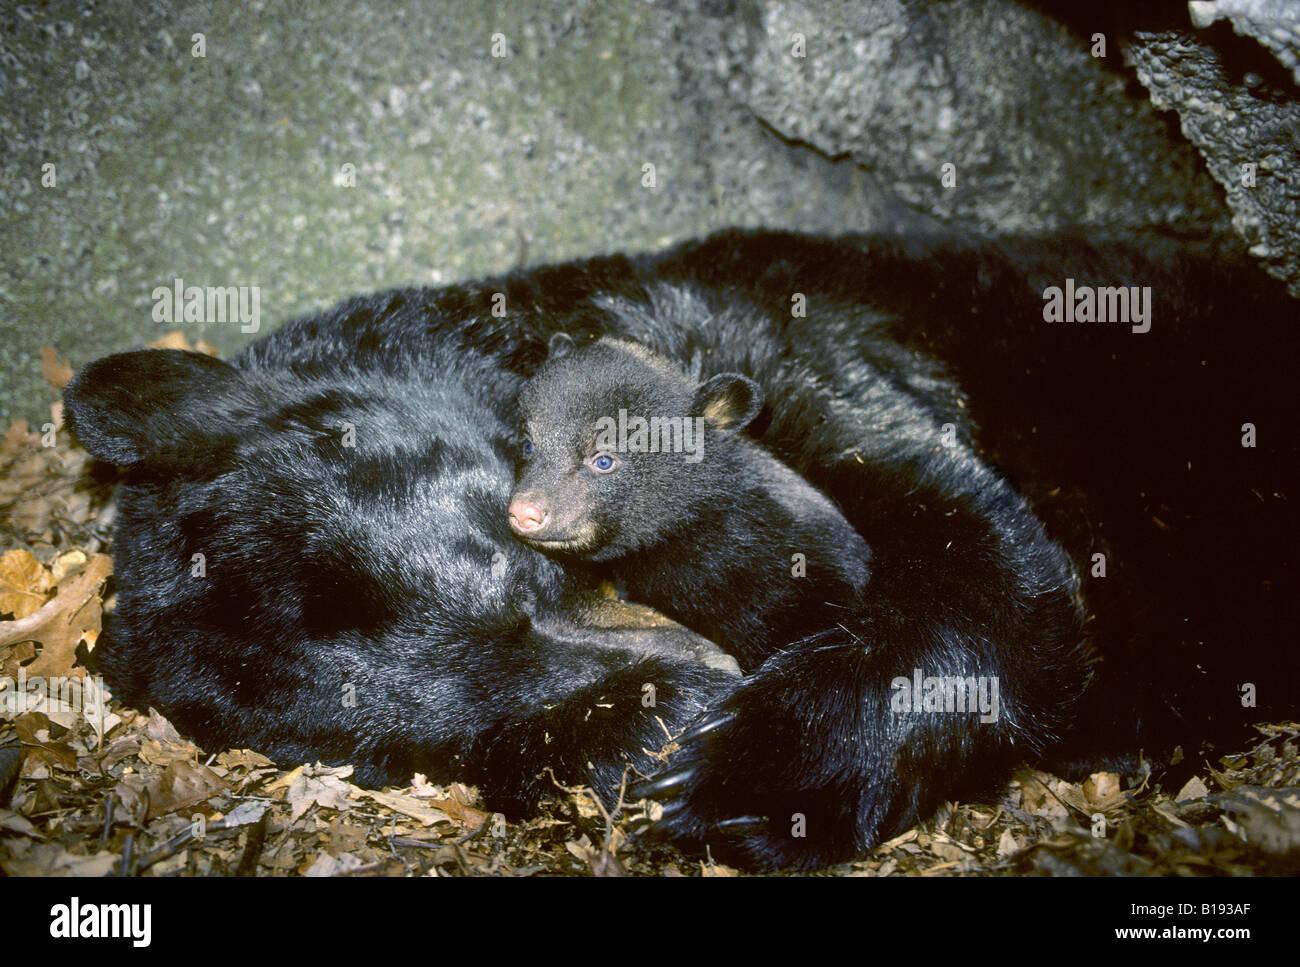 Hibernating mother black bear (Ursus americanus) with three-month old cub. - Stock Image